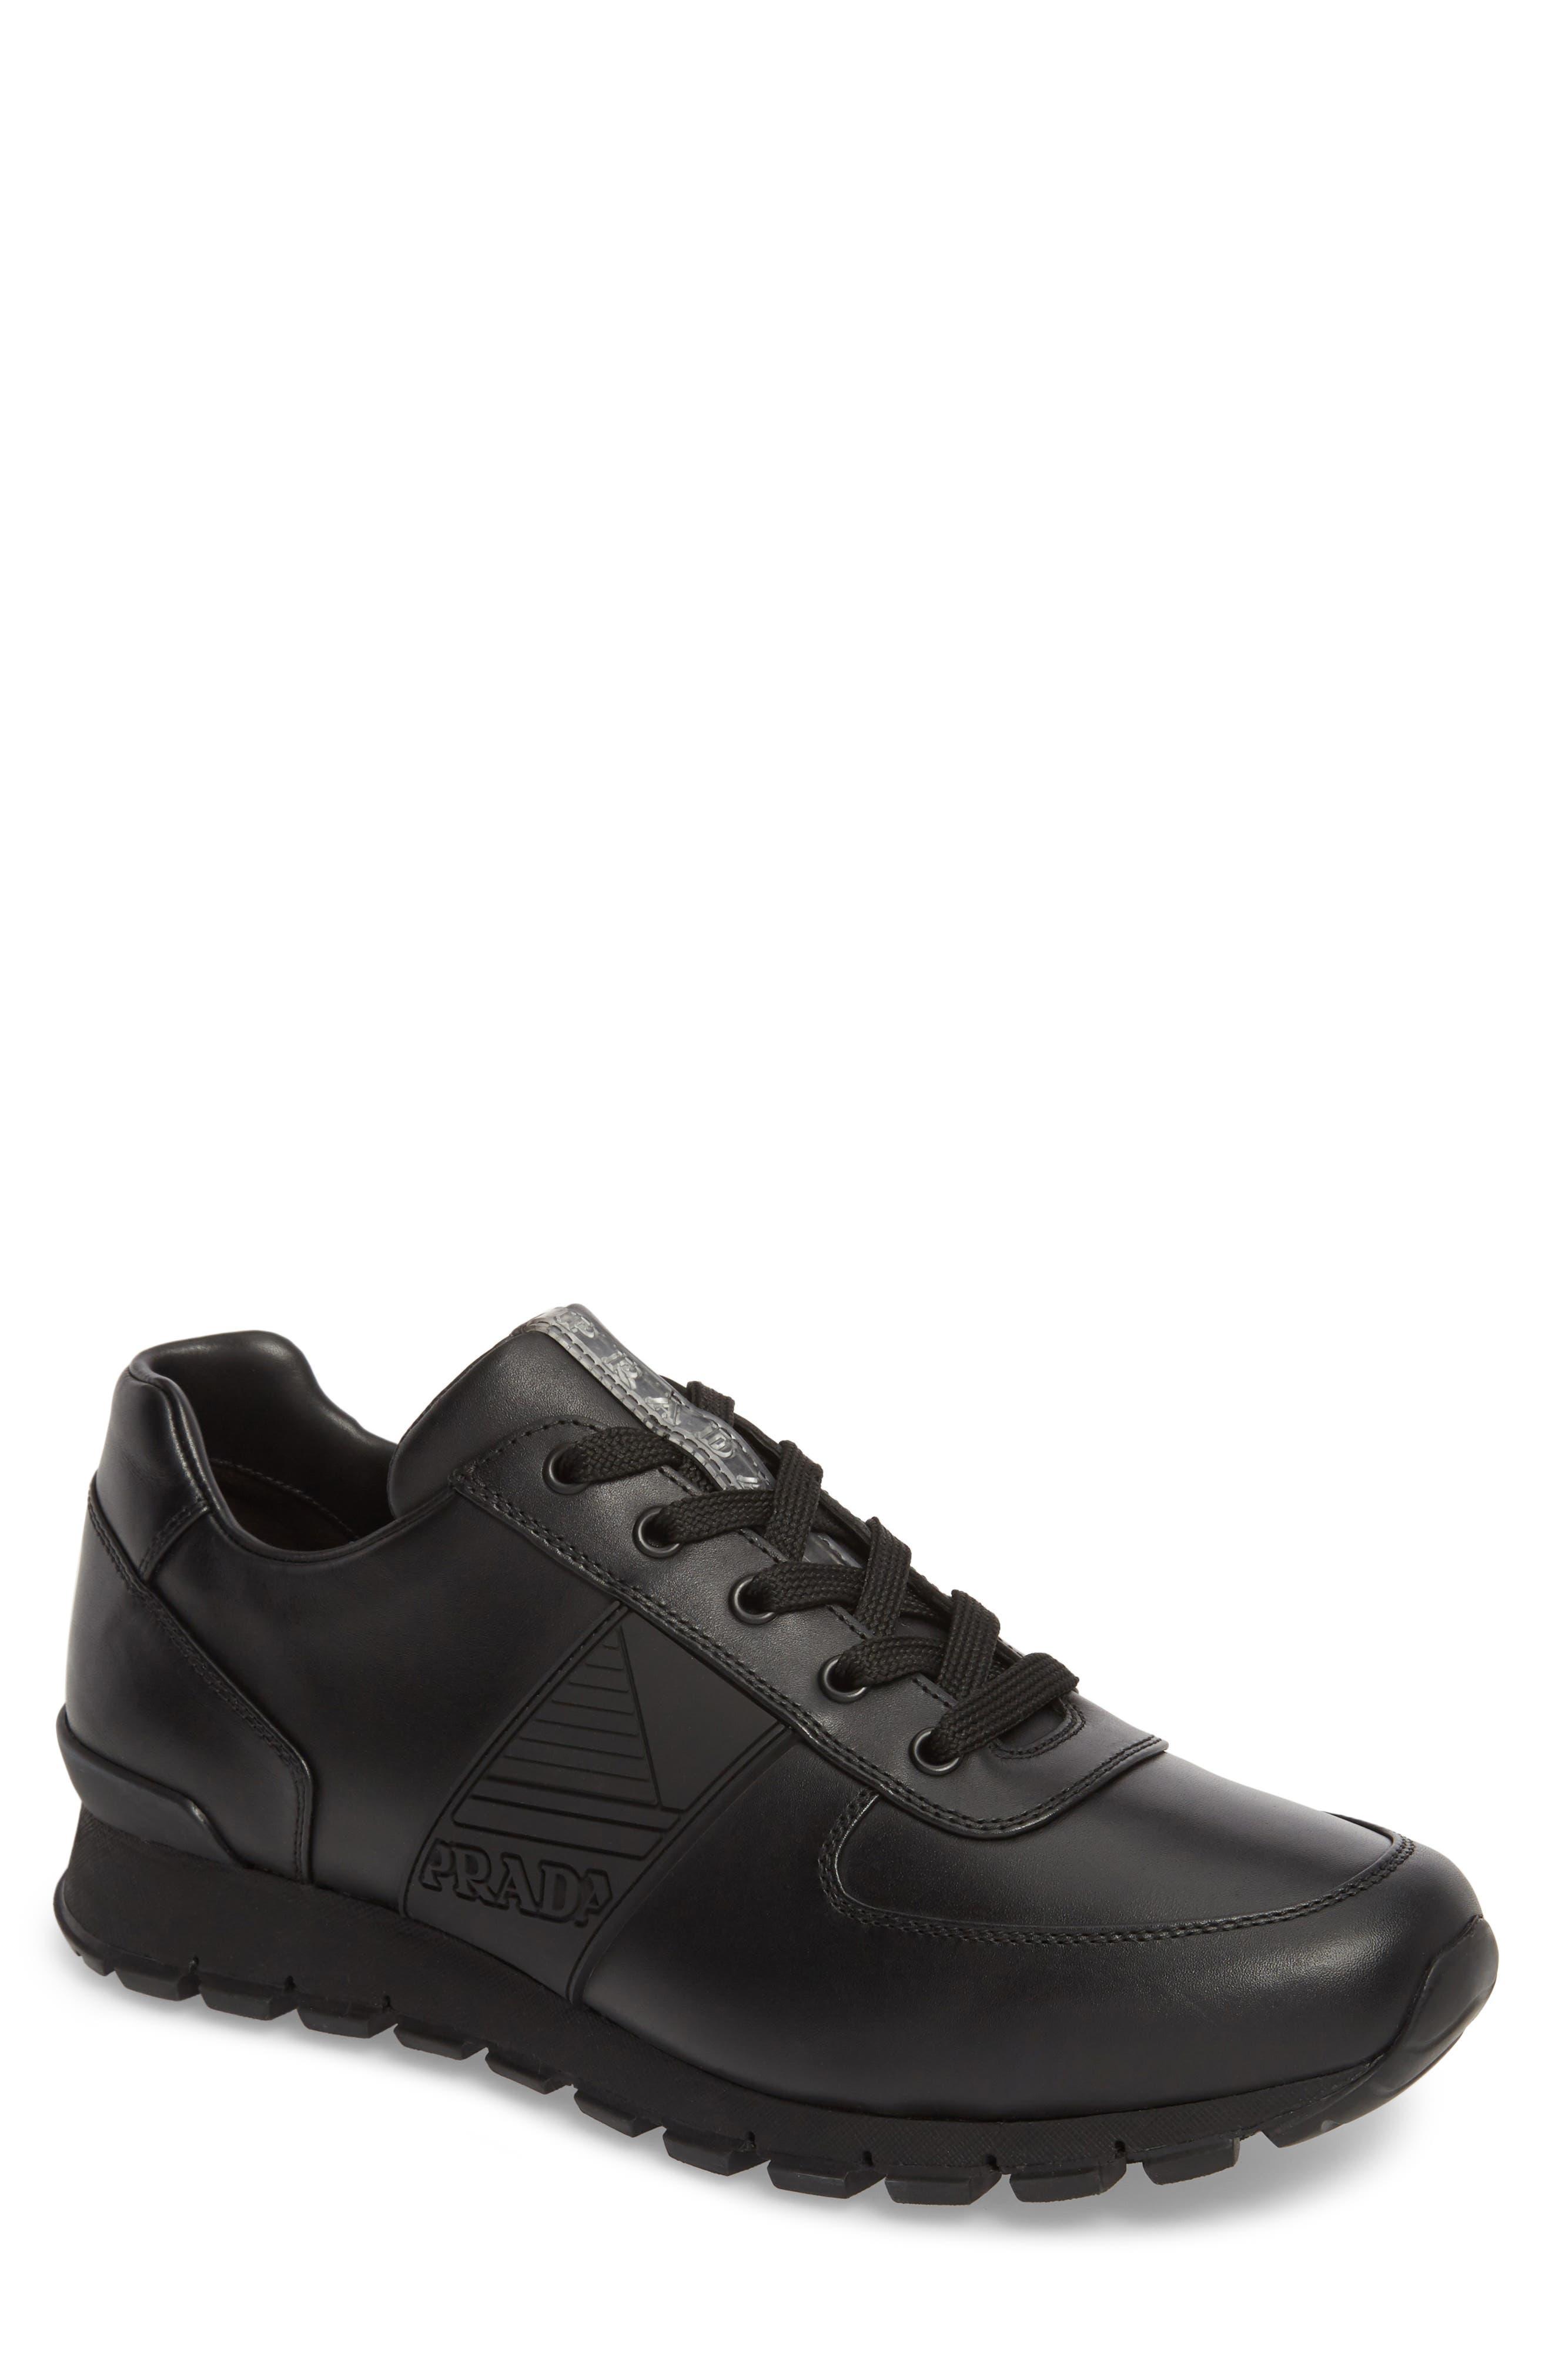 Linea Rossa Sneaker,                             Main thumbnail 1, color,                             NERO